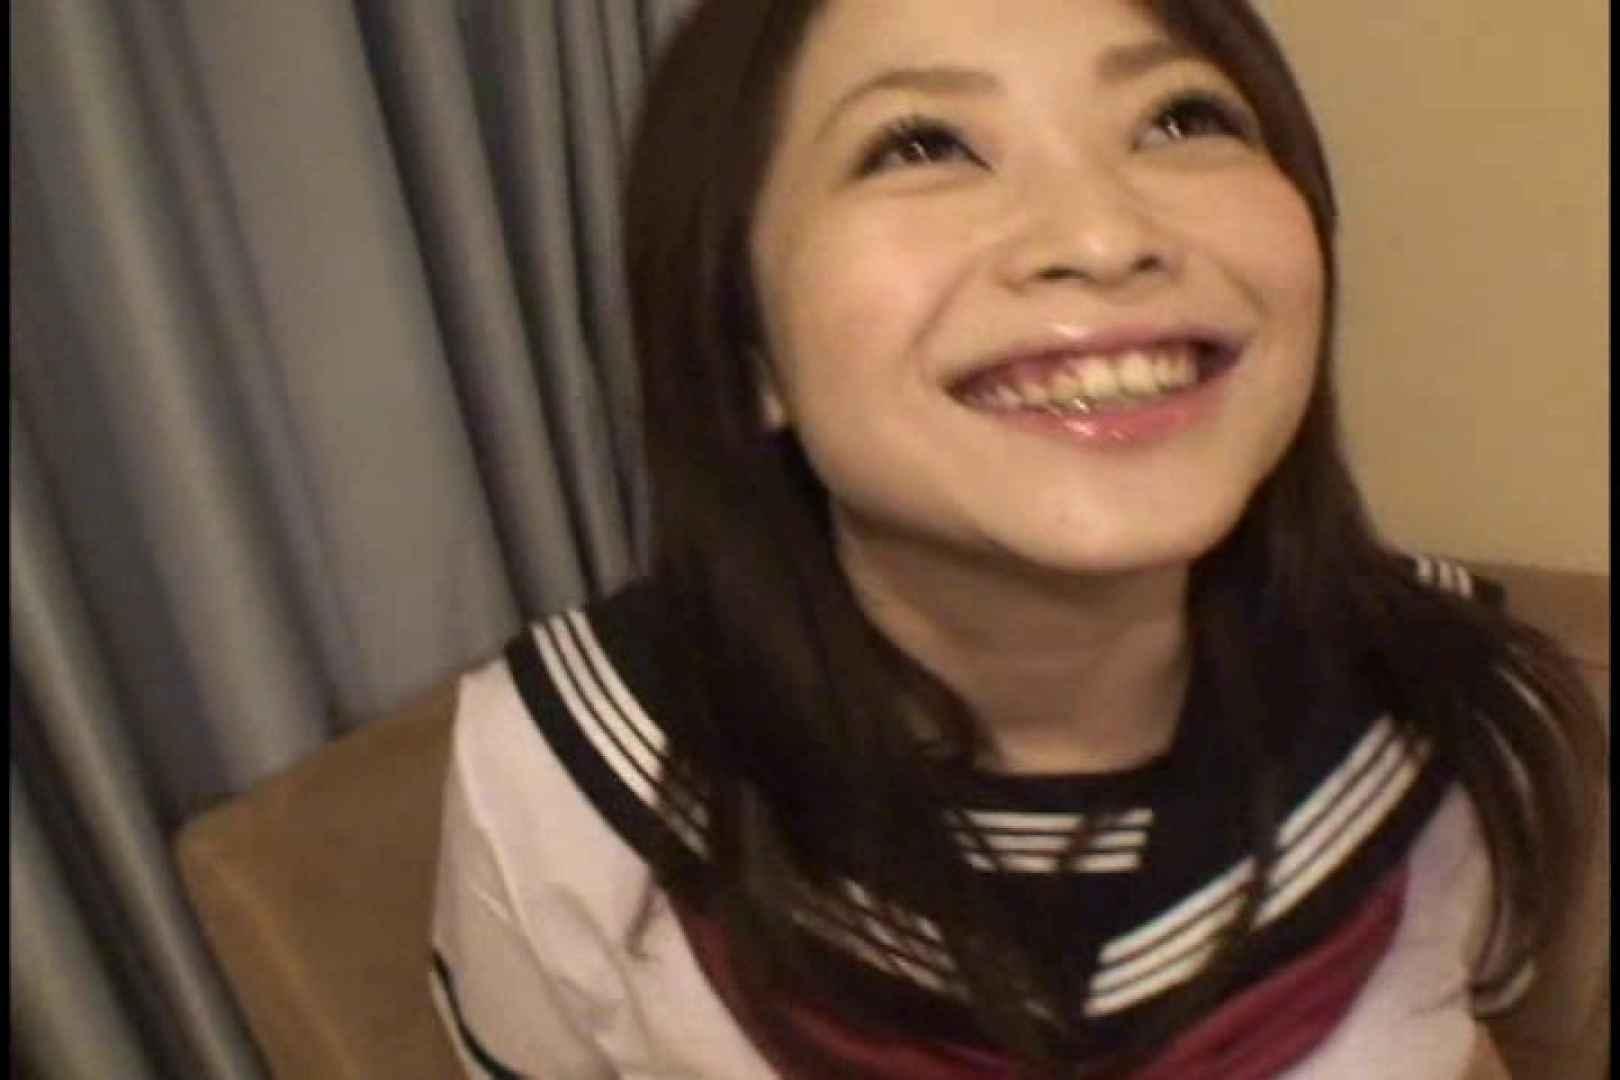 JDハンター全国ツアー vol.006 後編 女子大生のエロ動画 | 0  97PIX 31